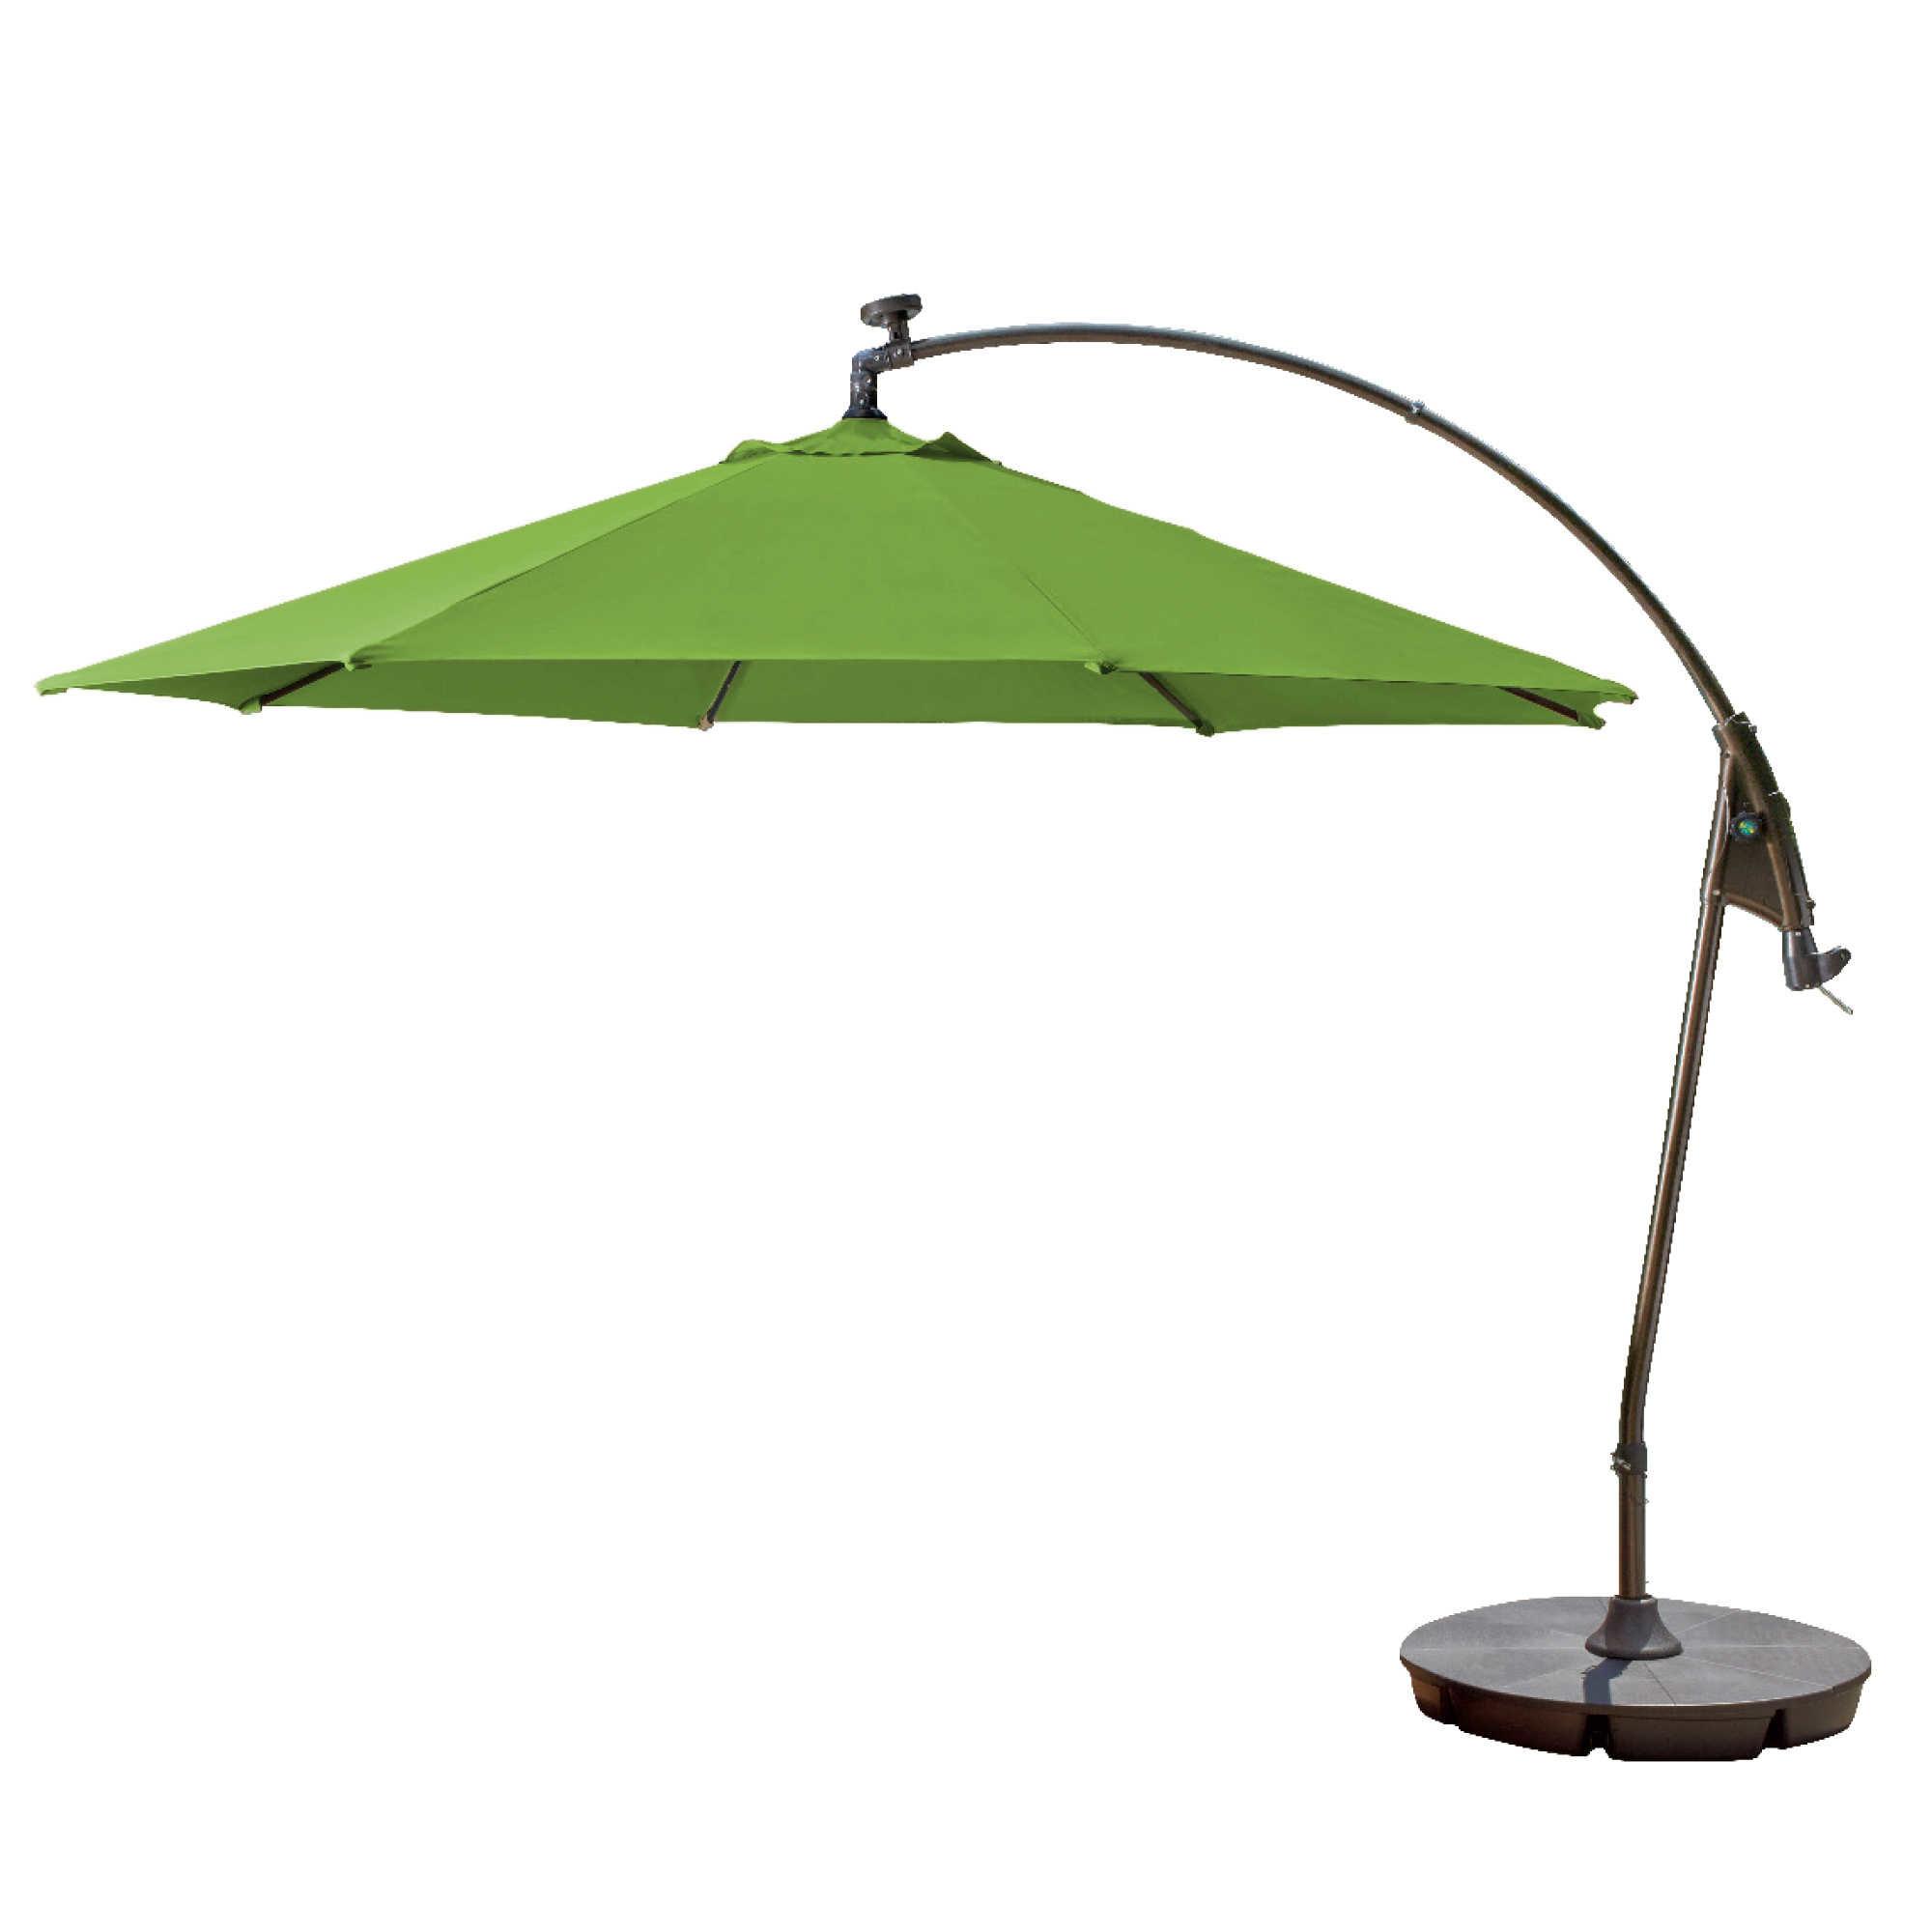 Ceylon Cantilever Sunbrella Umbrellas Throughout Most Current Pottsville Solar Cantilever Sunbrella Umbrella (View 11 of 20)